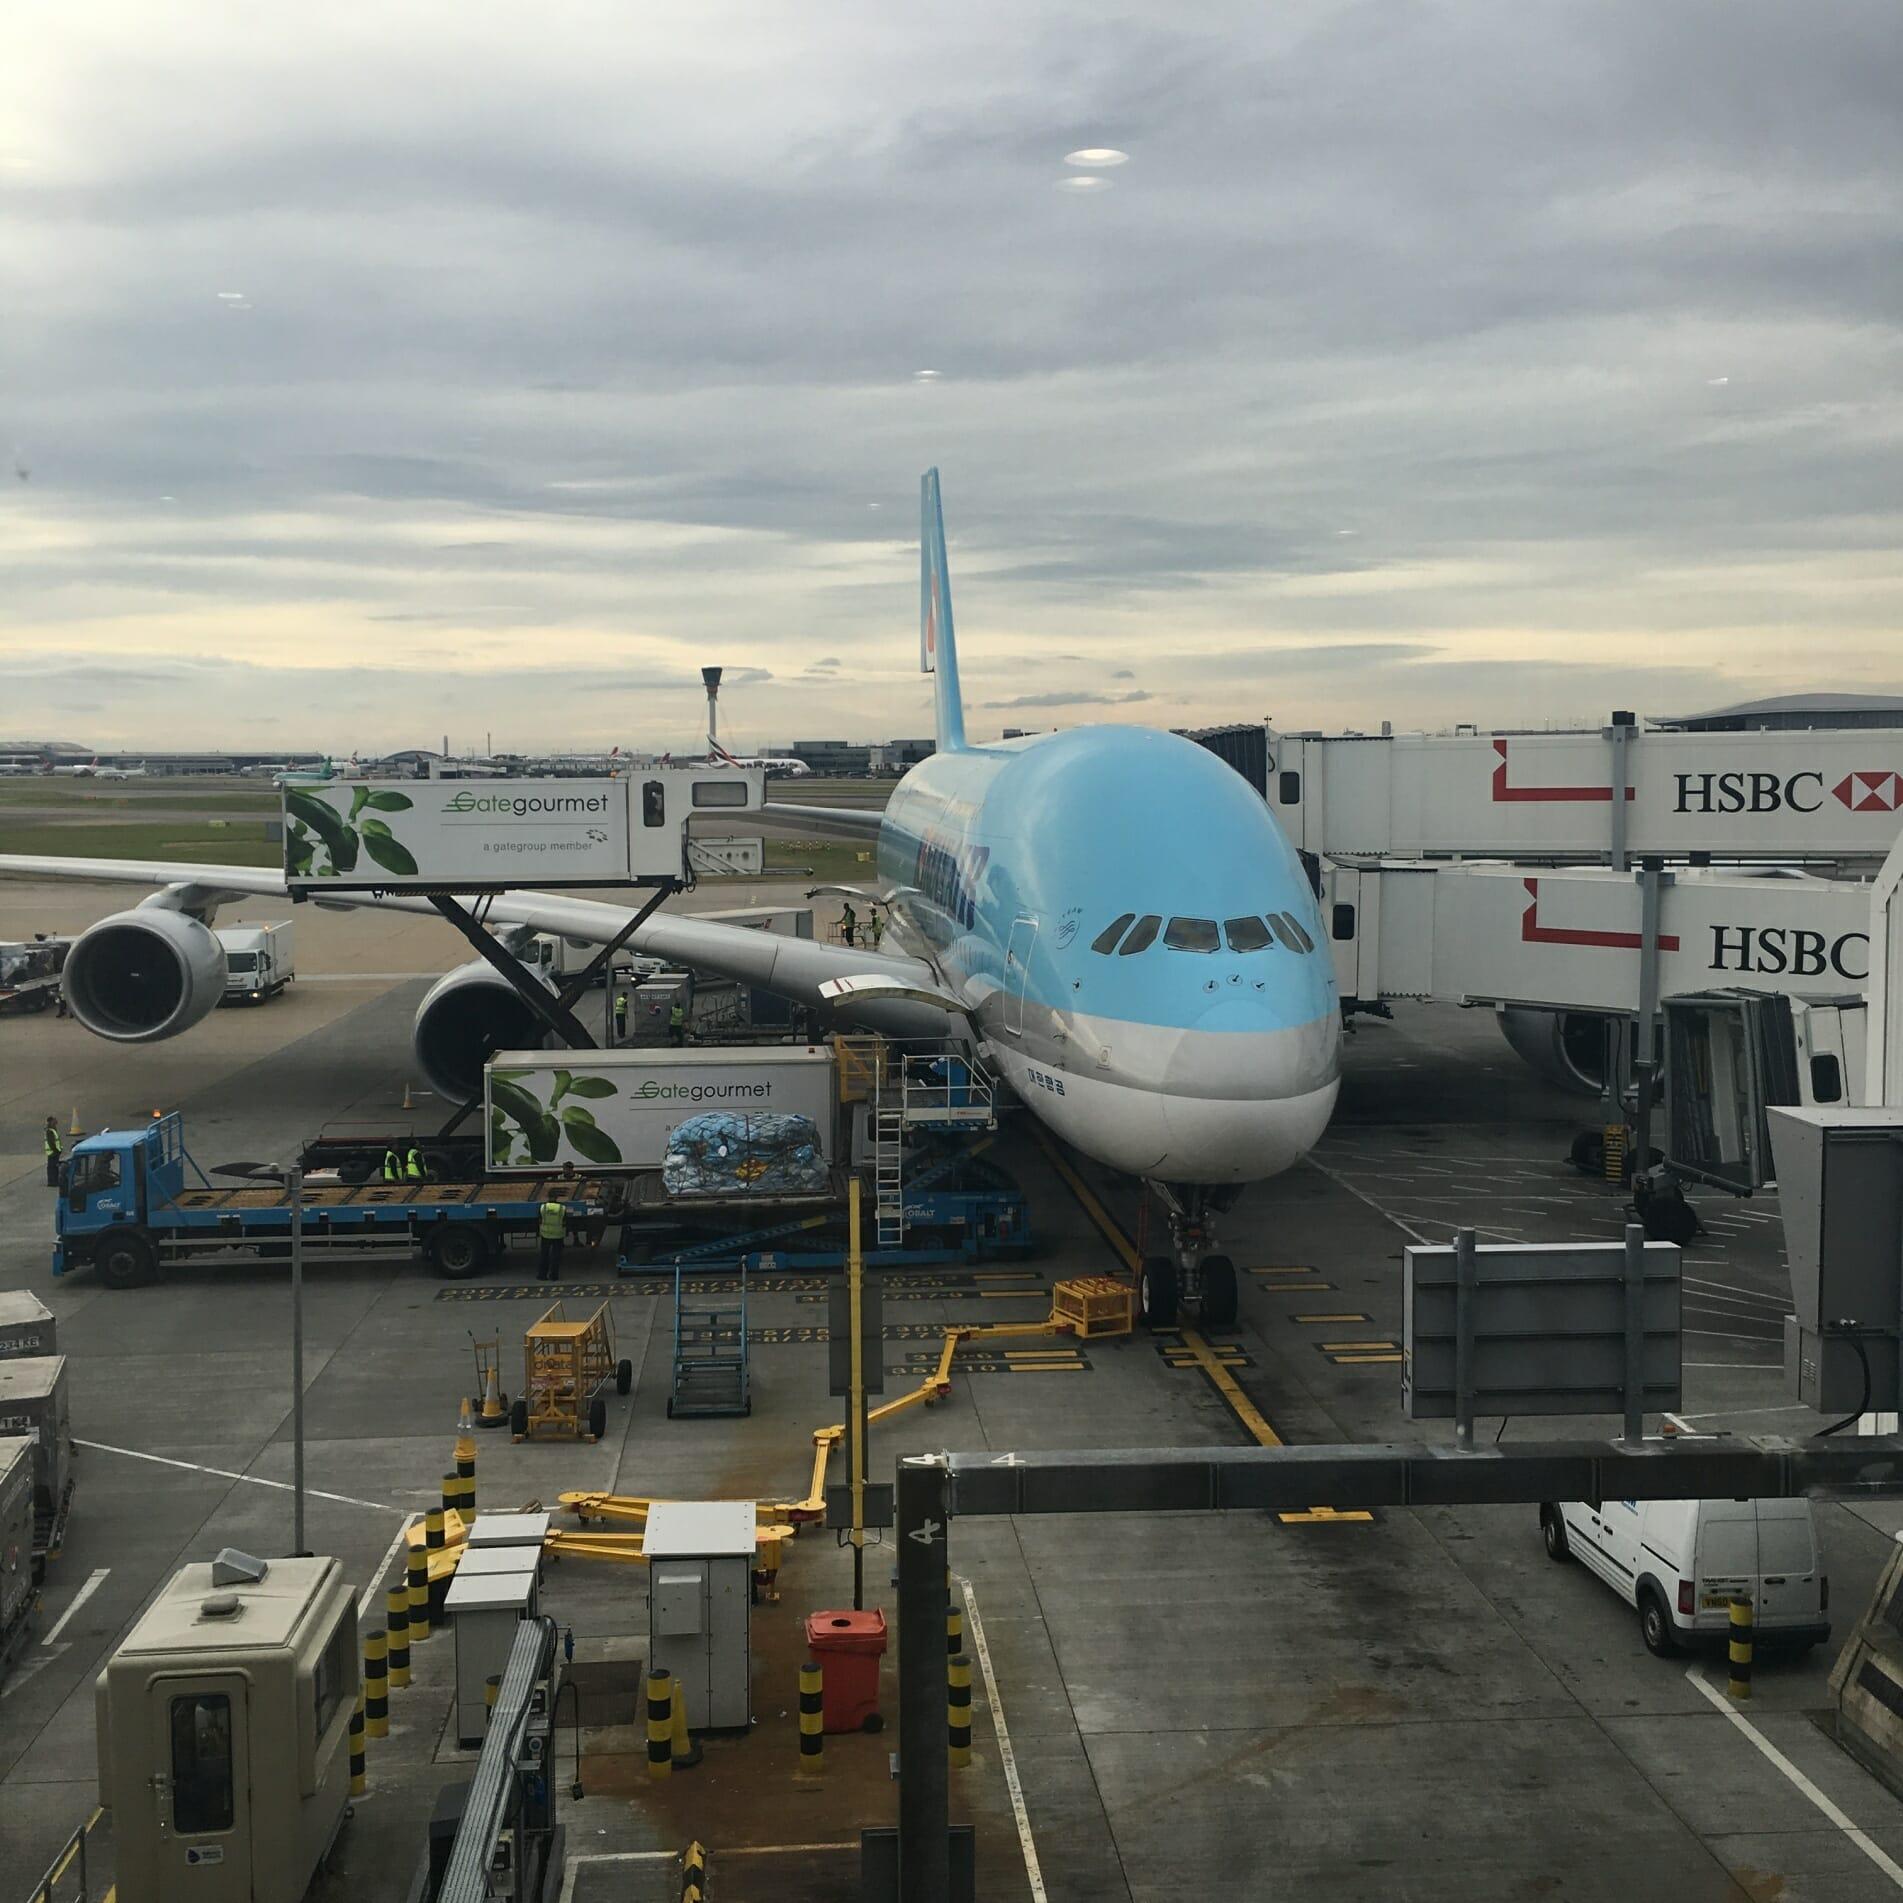 Double Decker plane, airport, huge plane,